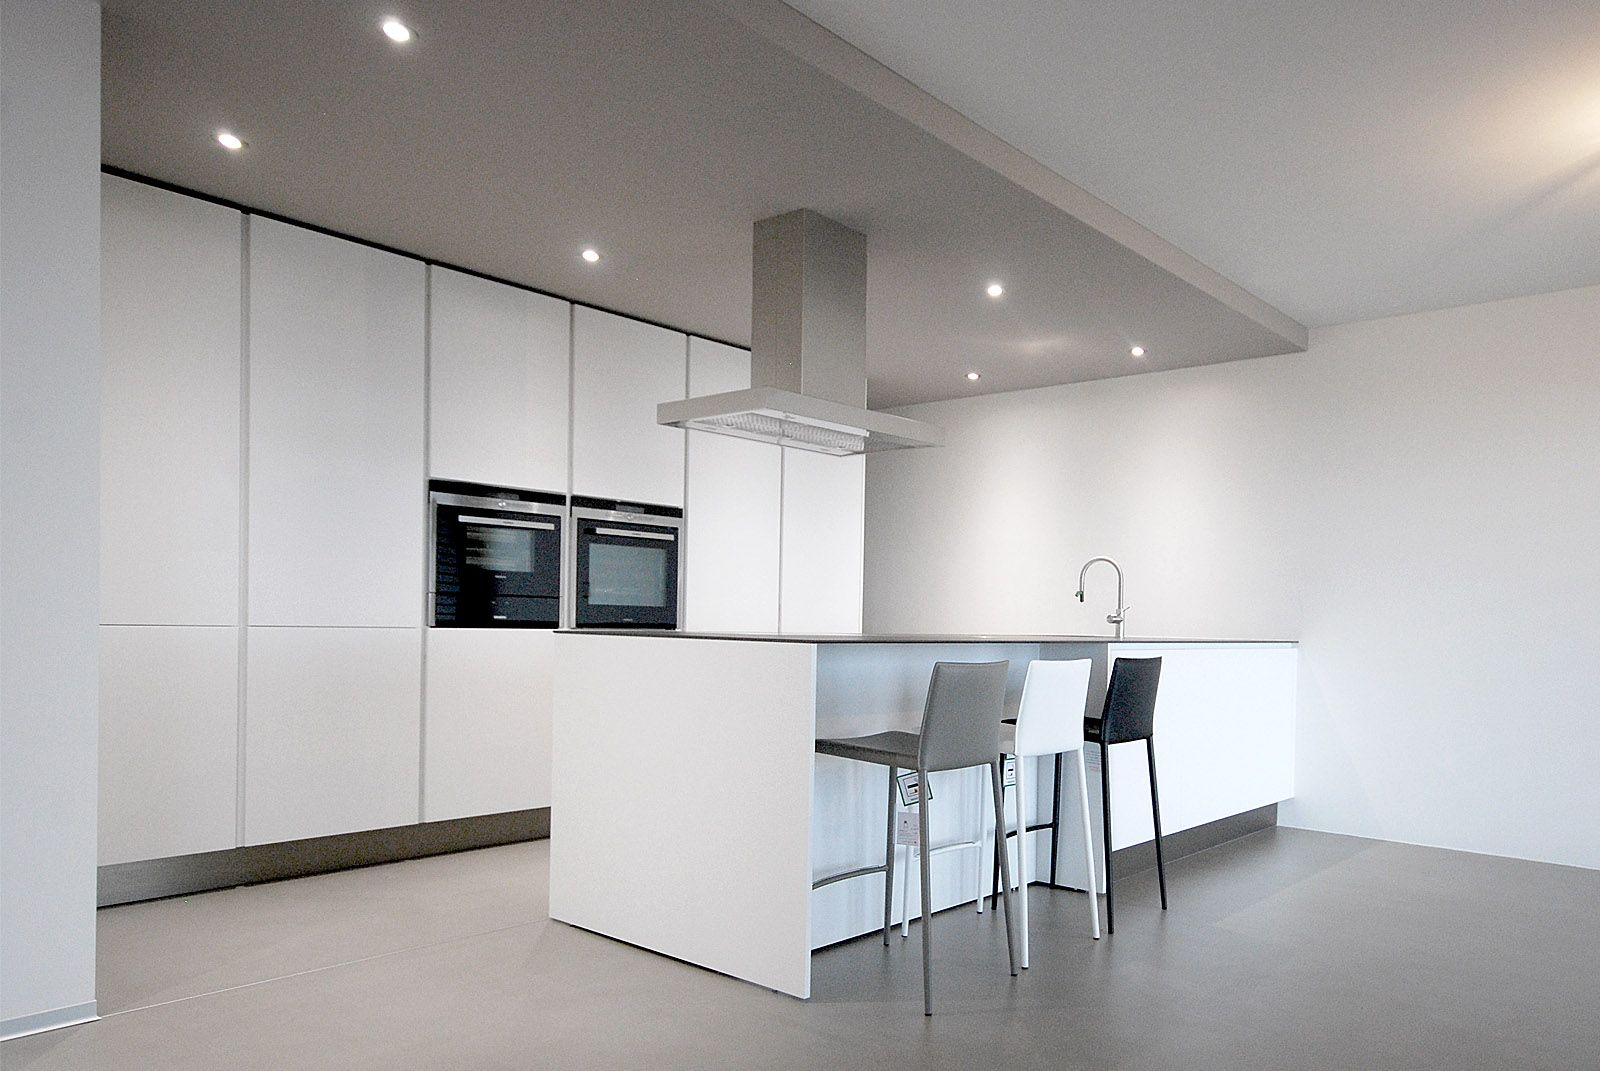 Progetto Cucina Varenna Poliform. Cucina moderna di design laccata ...